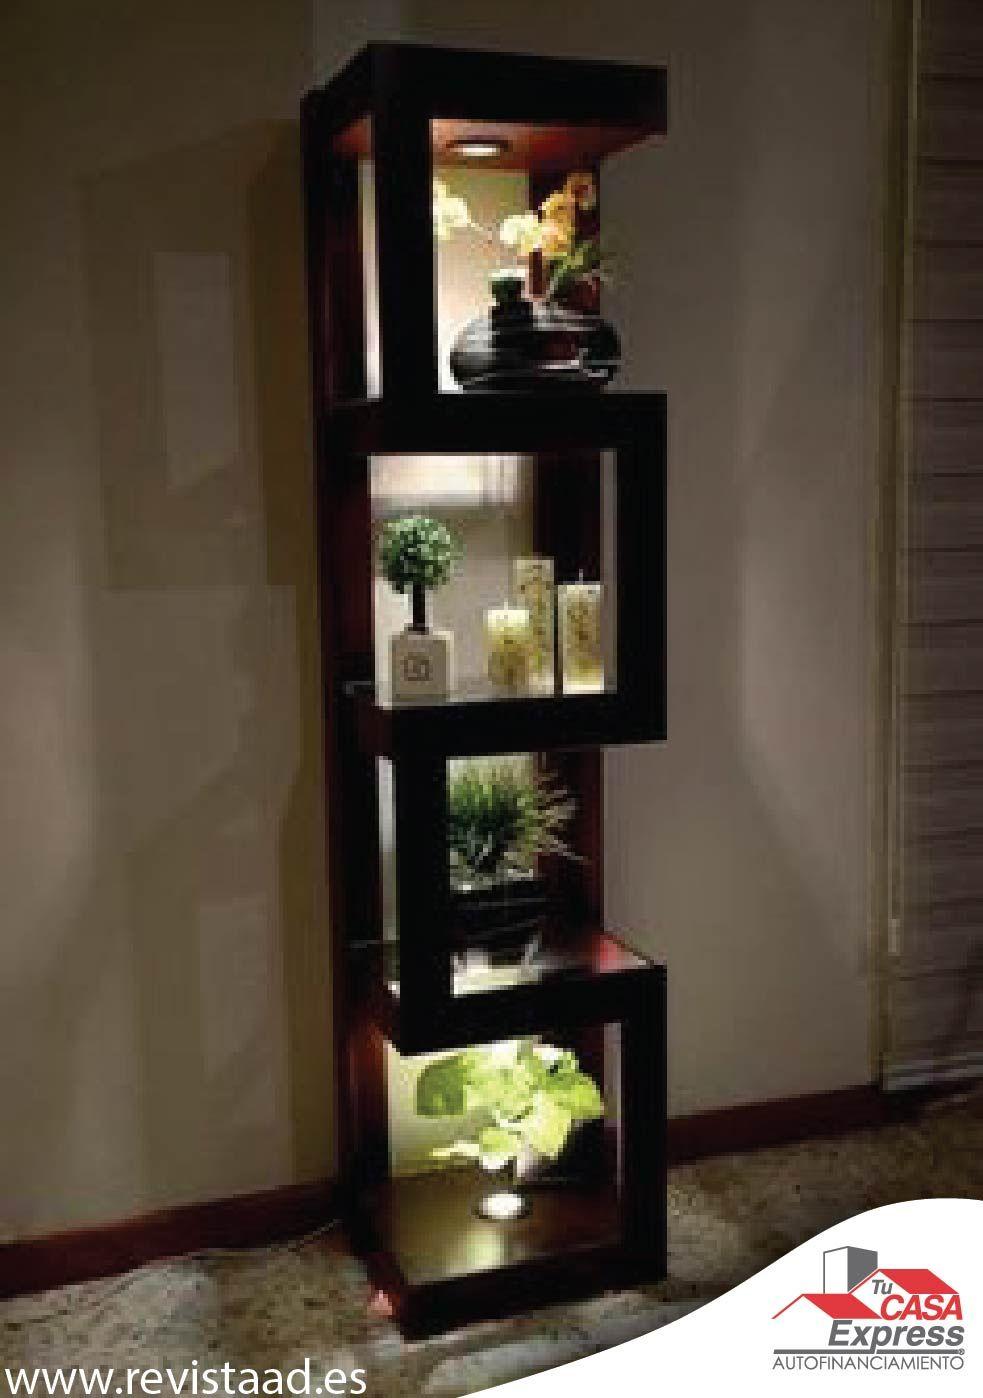 Una Idea Para La Sala Les Gusta Decoraci N Pinterest  # Muebles Esquineros Para Sala